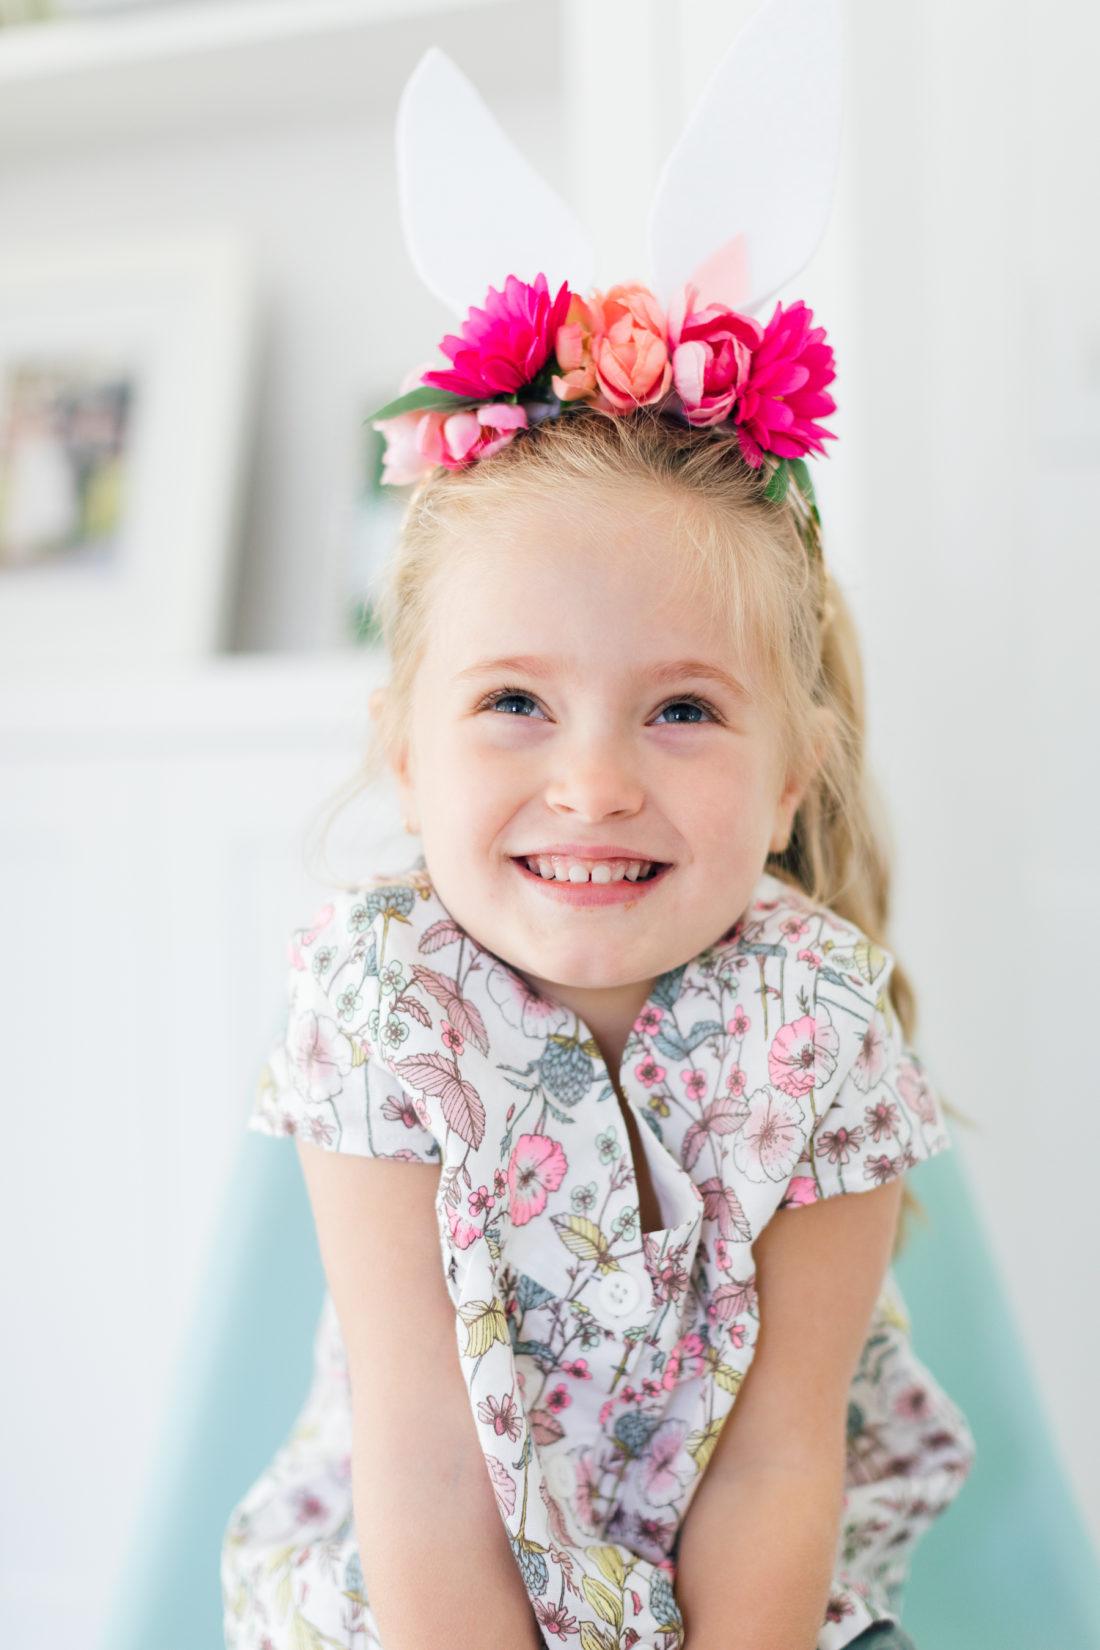 Eva Amurri Martino's daughter Marlowe wears her DIY Woodland Bunny Headband for Easter